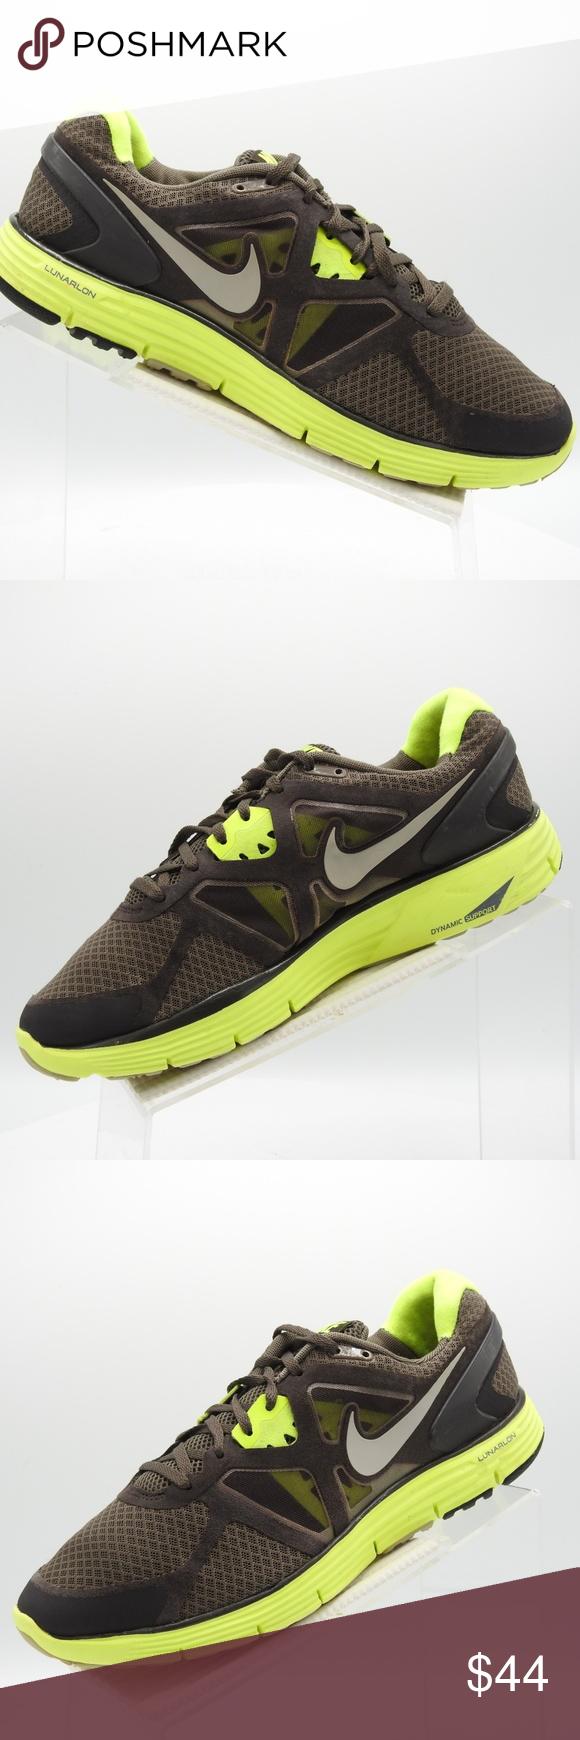 e7908c0fb7e62 Nike LunarGlide 3 454164-202 Size 9.5 Mens Shoes Nike LunarGlide 3 454164 -202